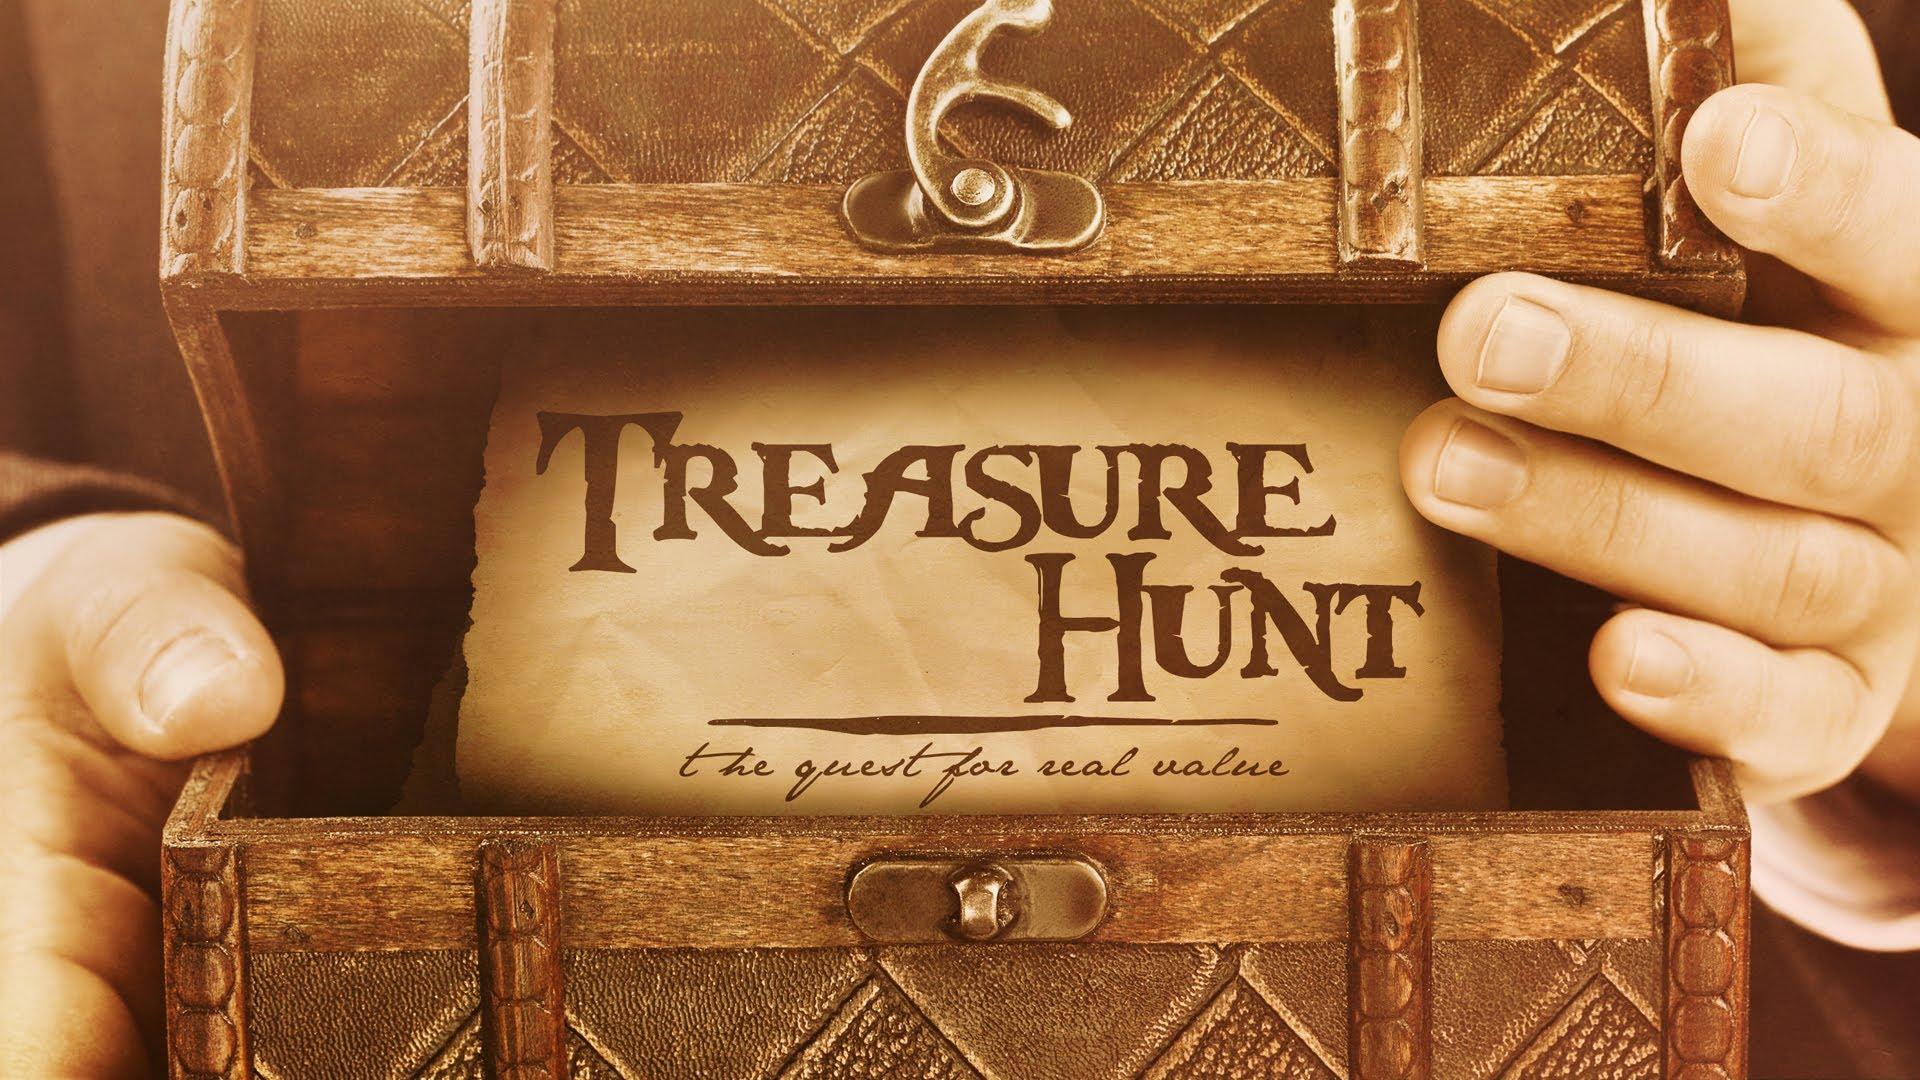 Treasure Hunt List >> Treasure Hunt (film) | Fanon Wiki | FANDOM powered by Wikia